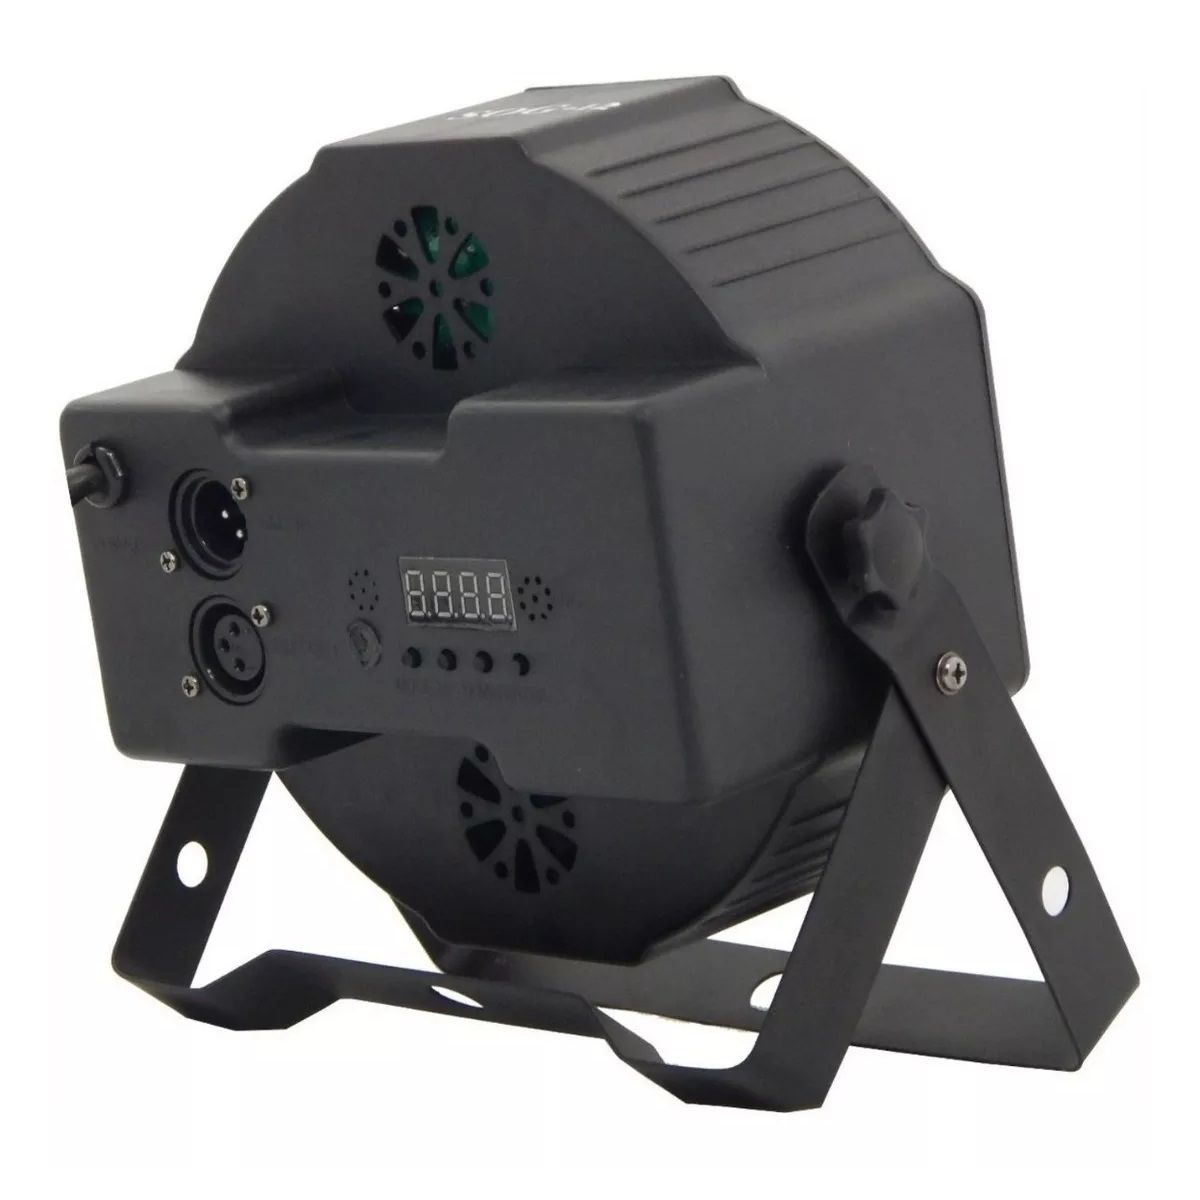 Kit 4x Canhão de Luz PAR 18 LEDs 1W RGB DMX Strobo Painel Digital